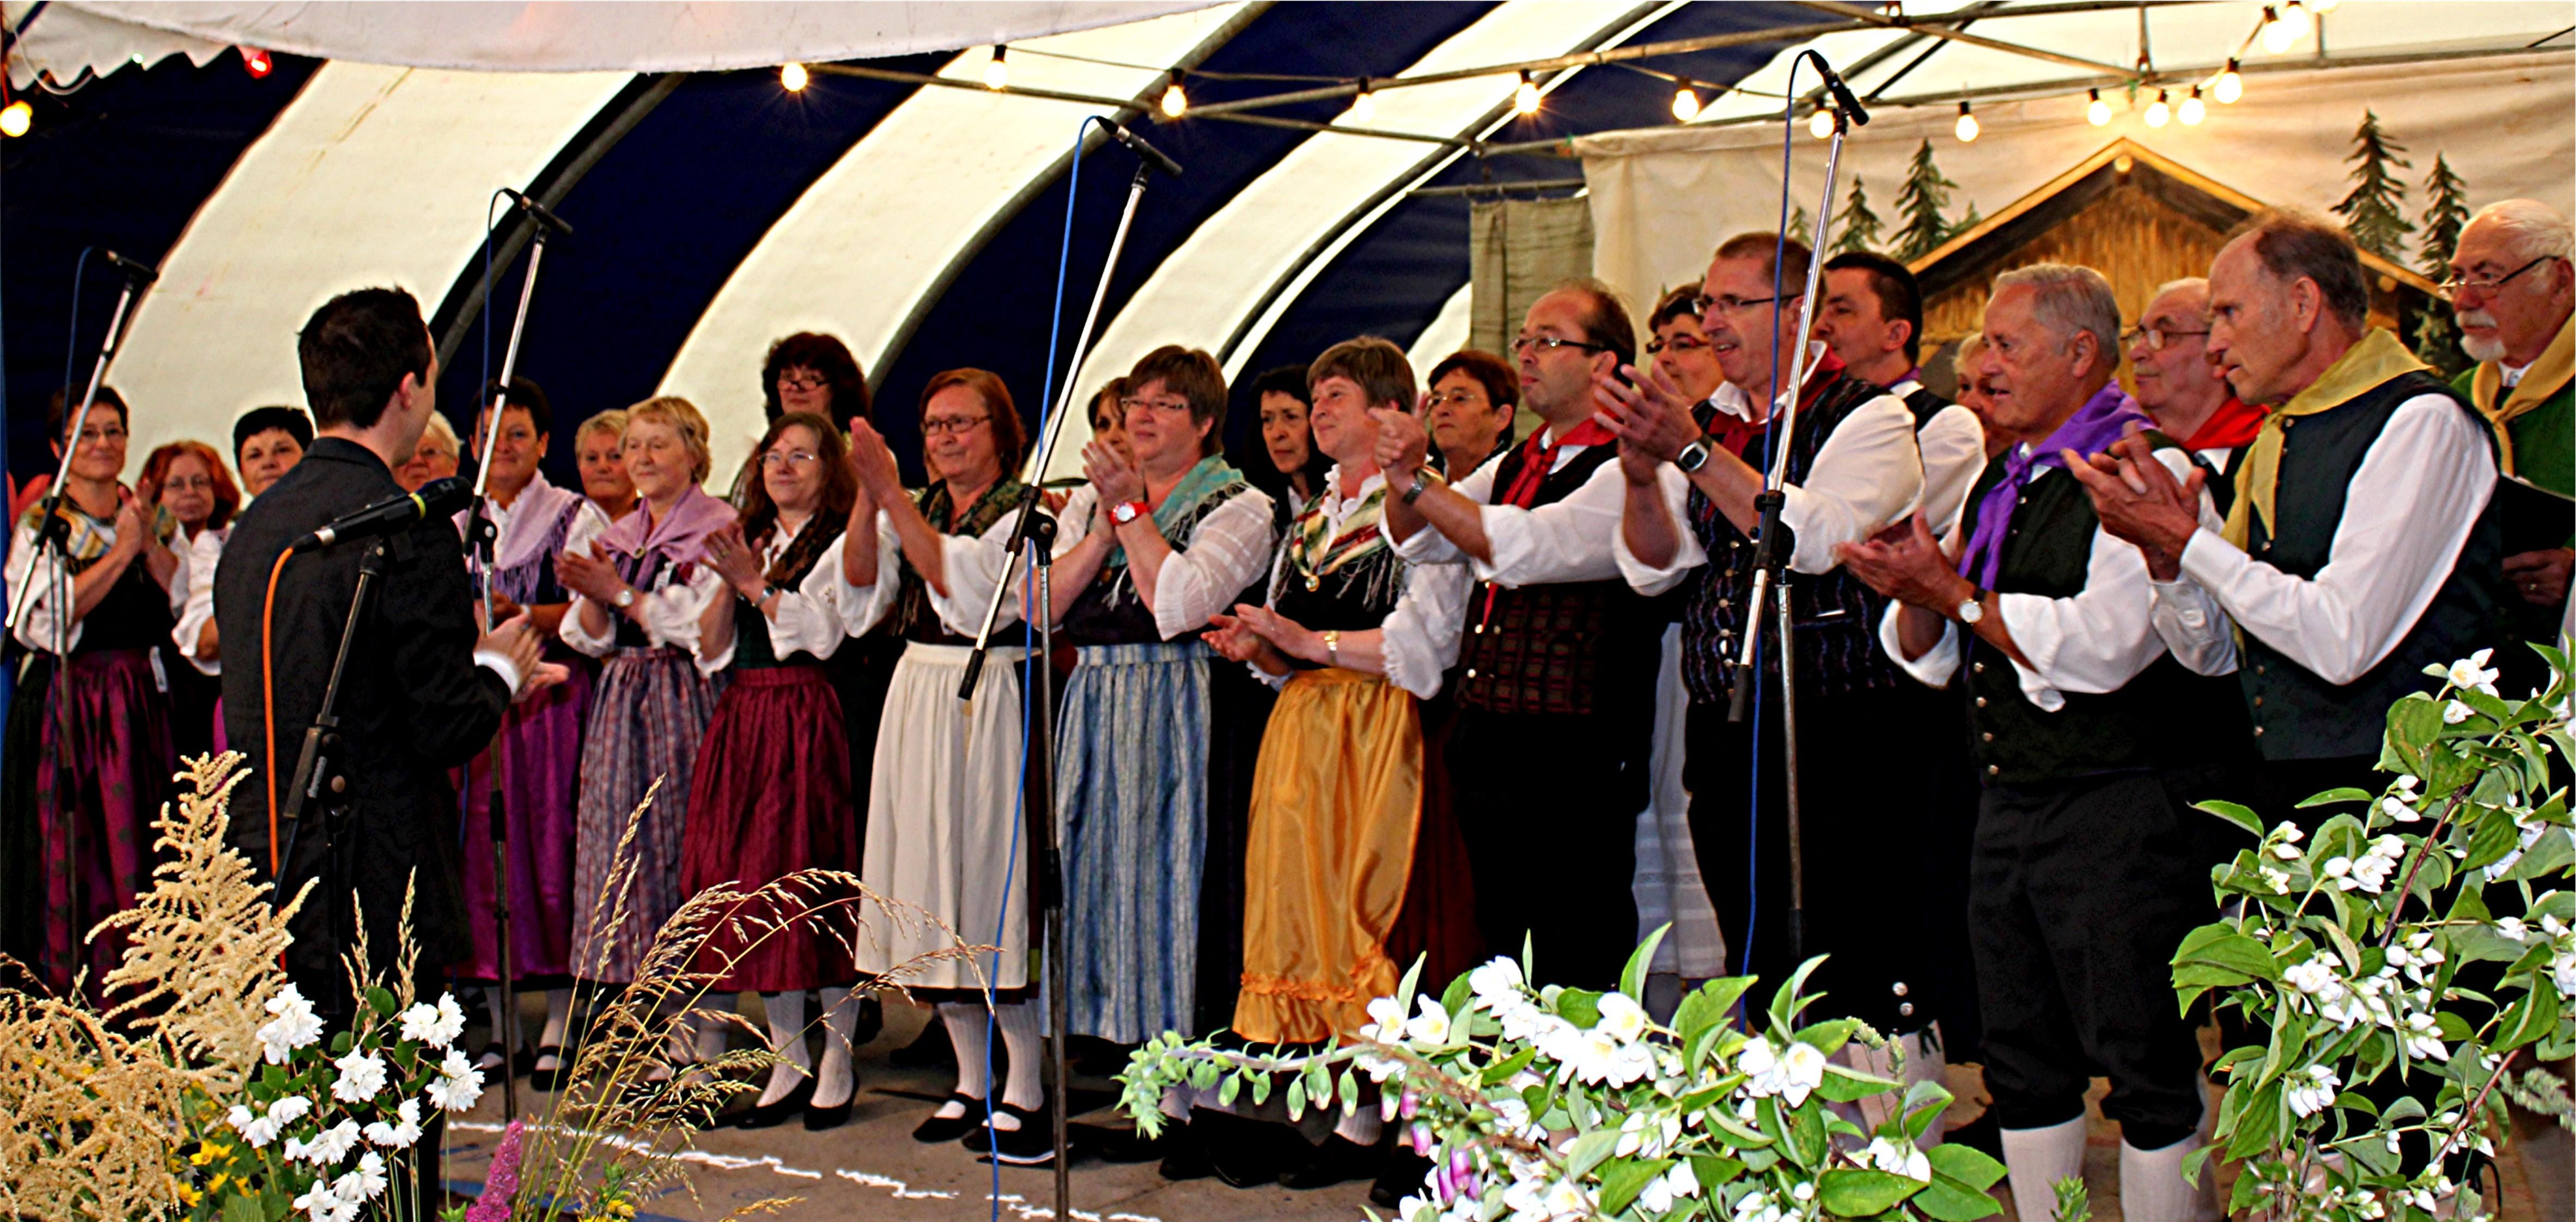 Folkloreensemble Neuhaus